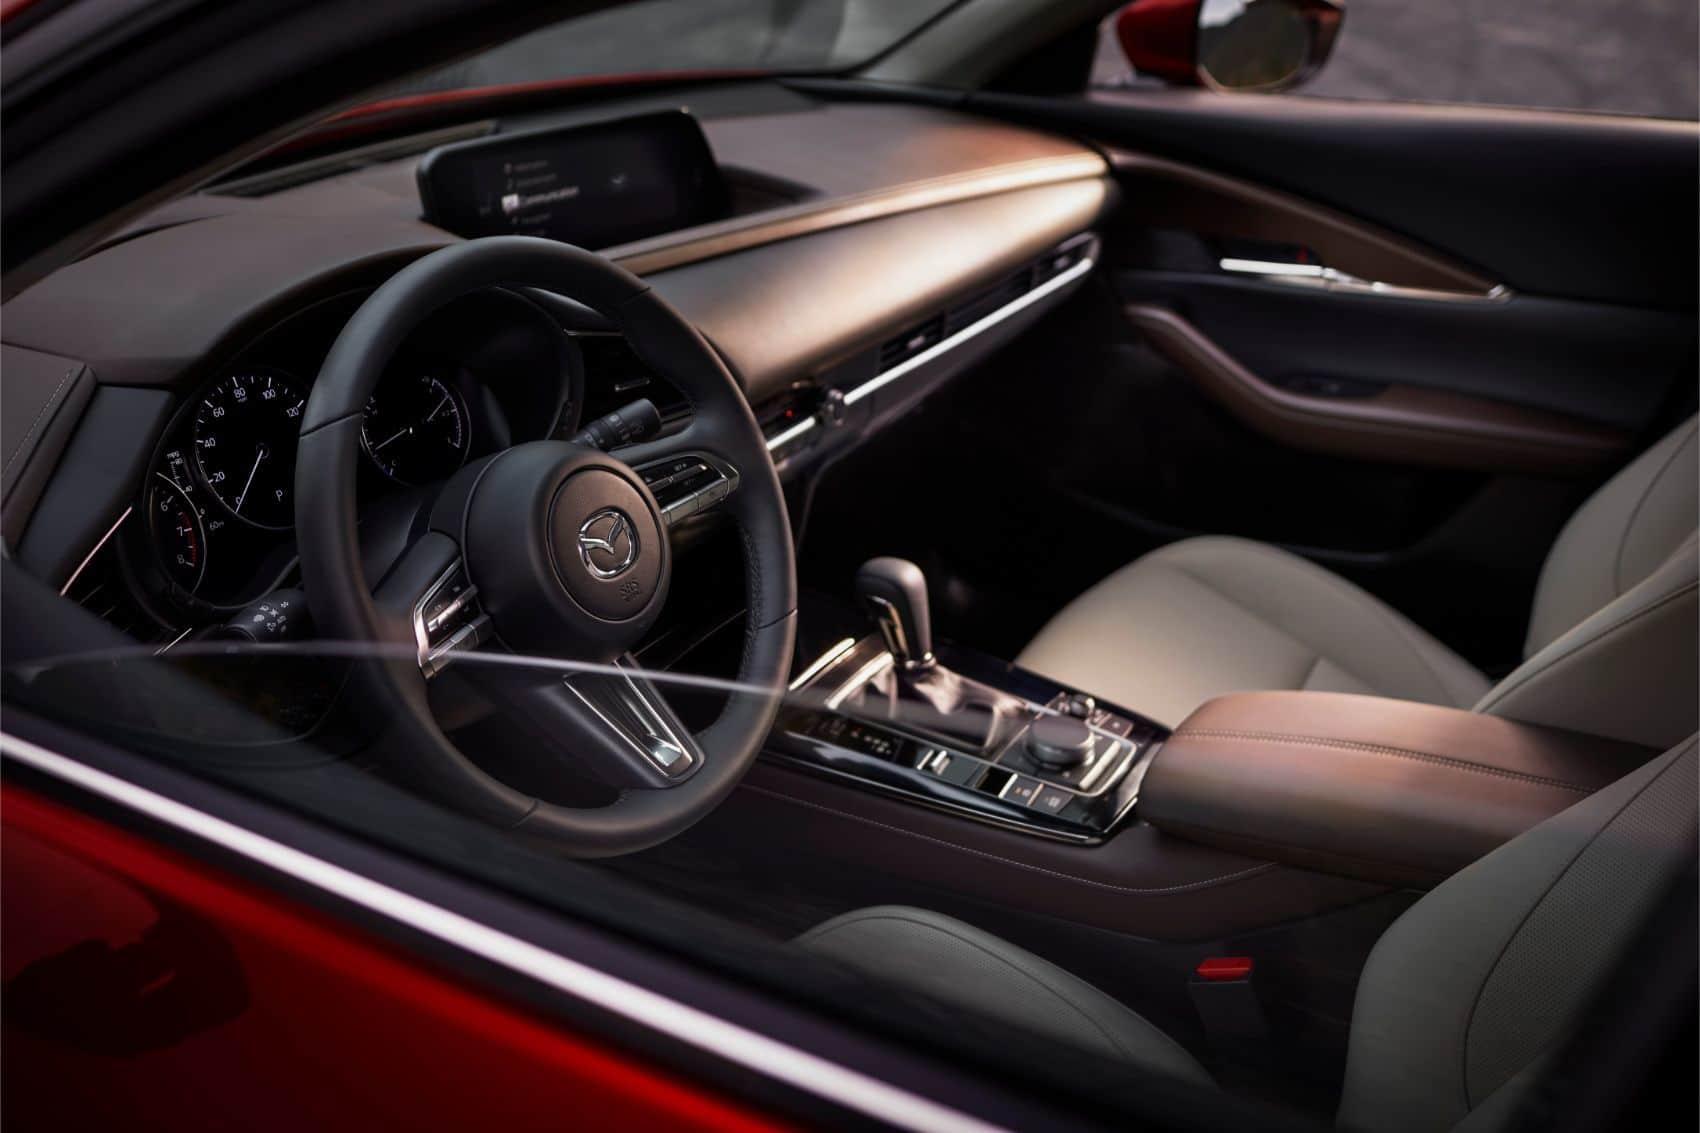 Mazda Extended Warranty: Is It Worth It? (2020)